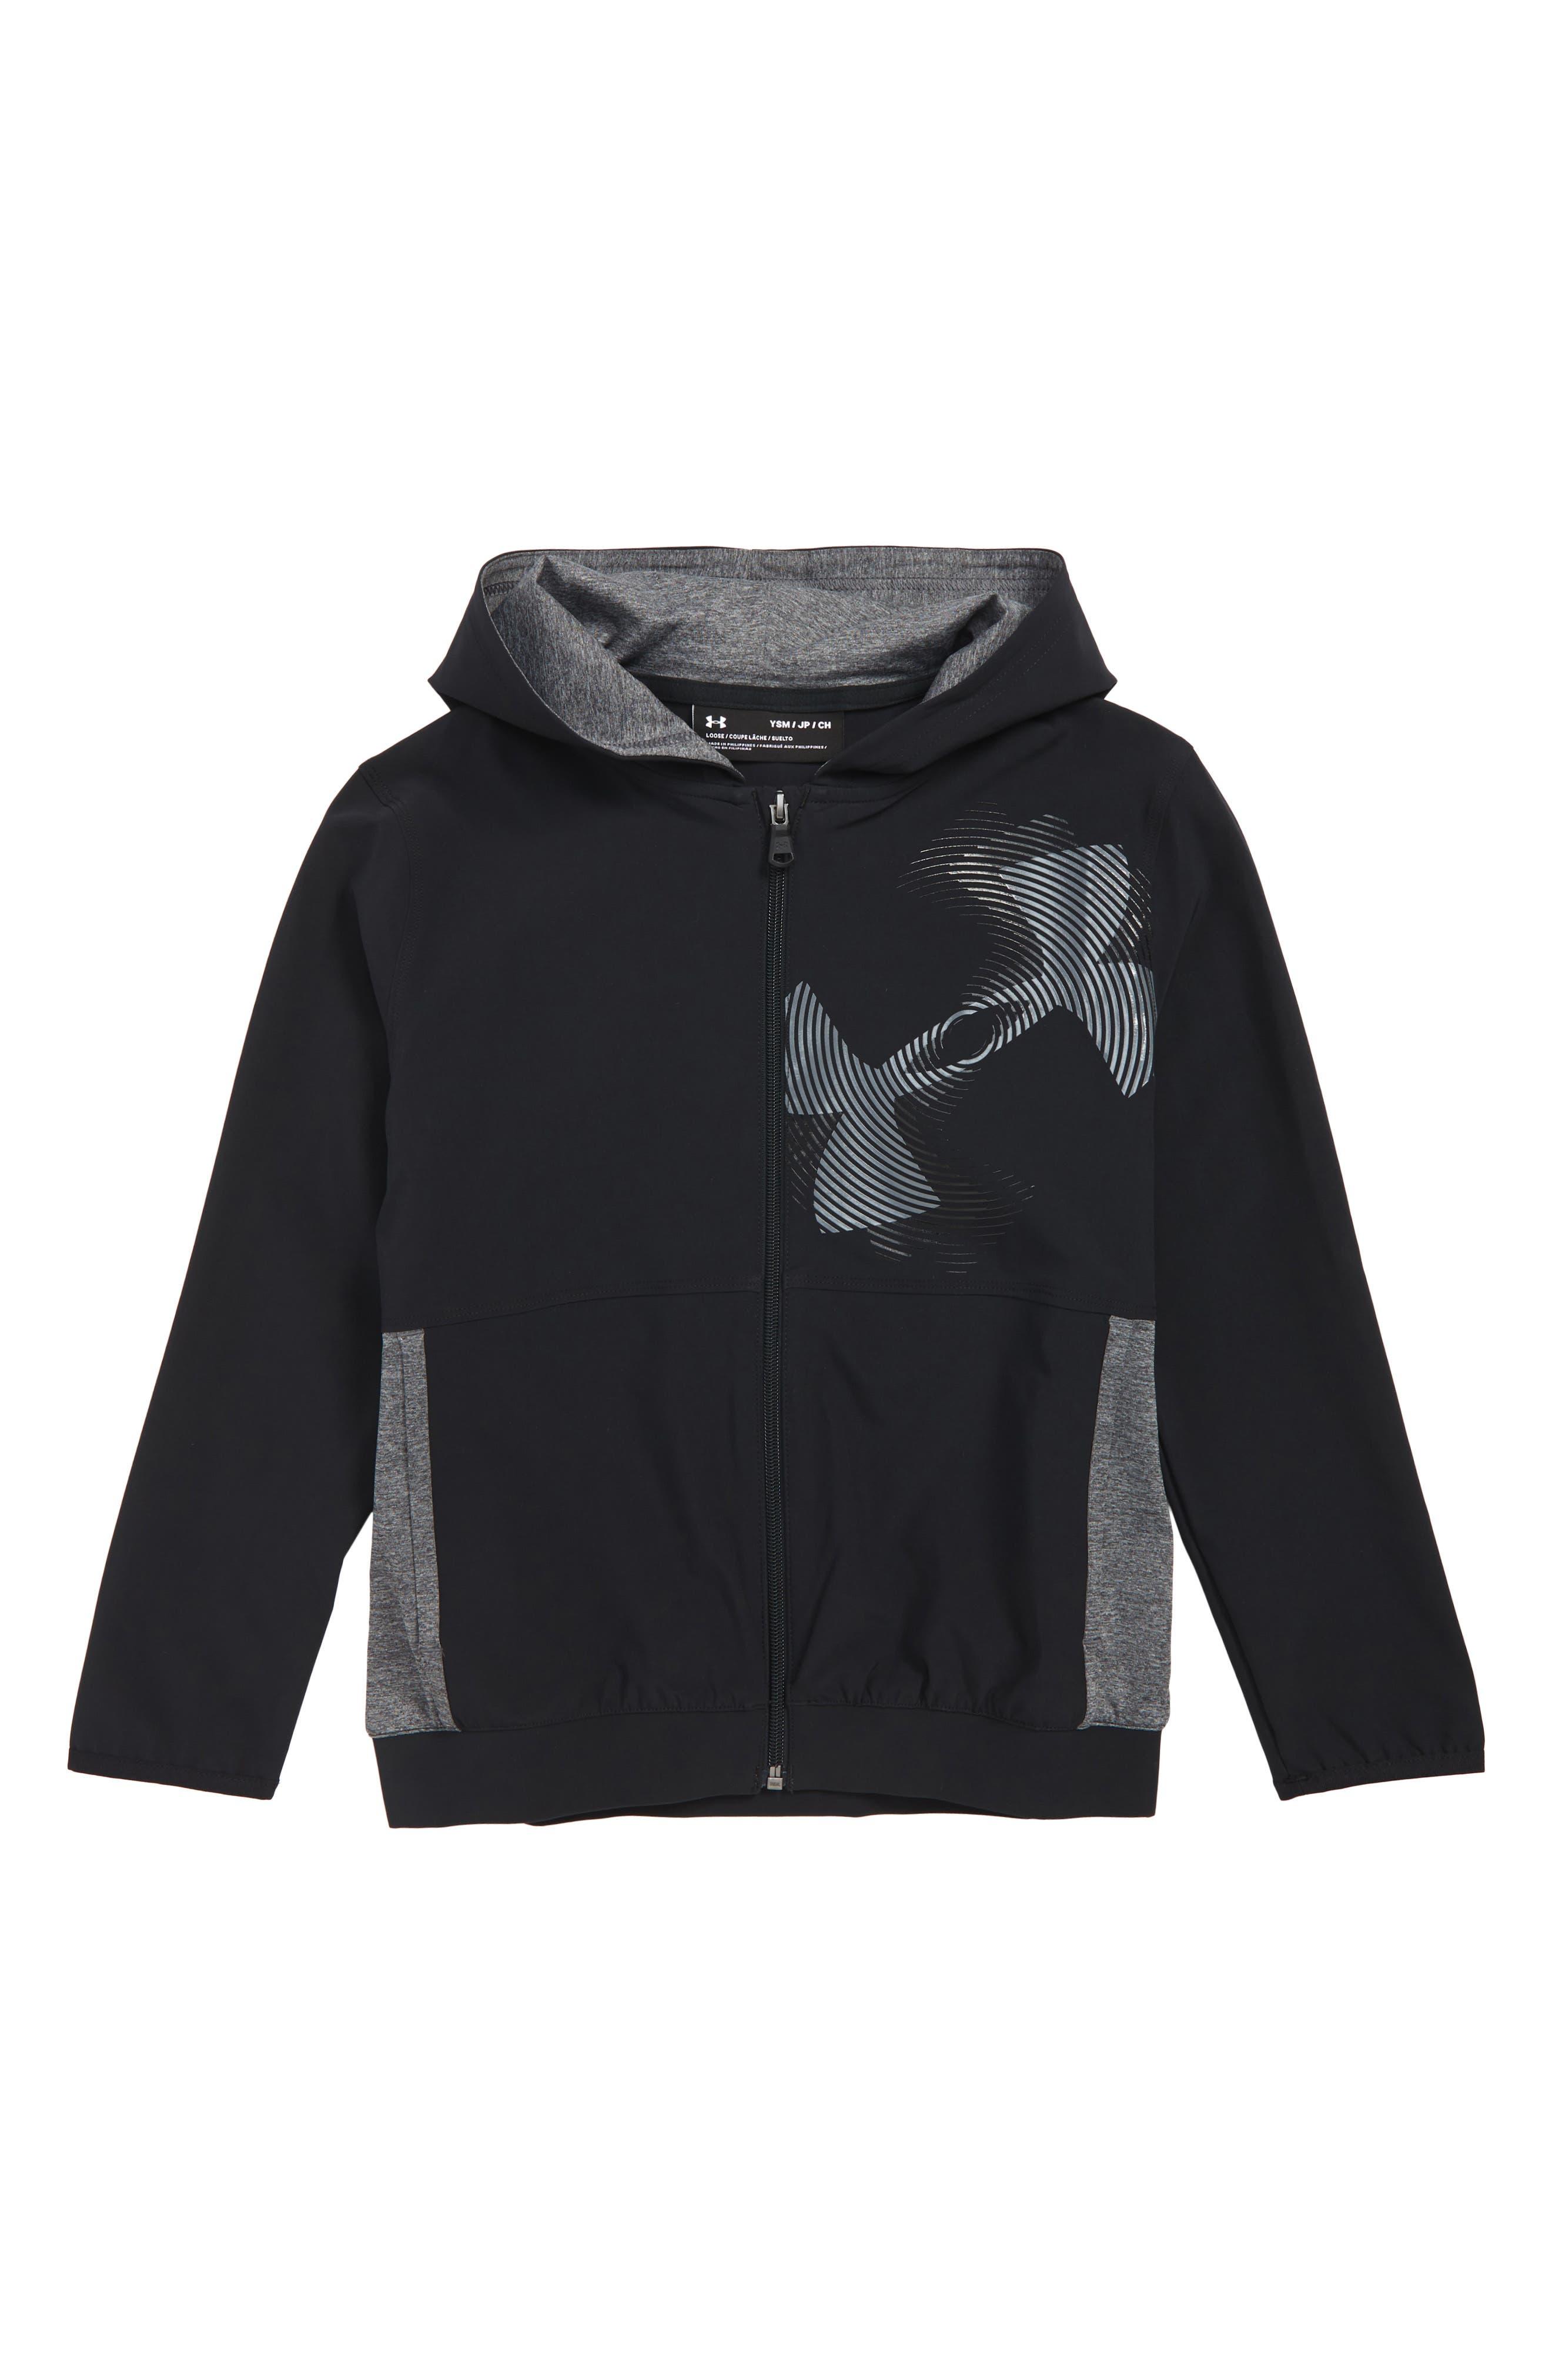 Woven Hooded Warm-Up Jacket,                             Main thumbnail 1, color,                             BLACK / BLACK